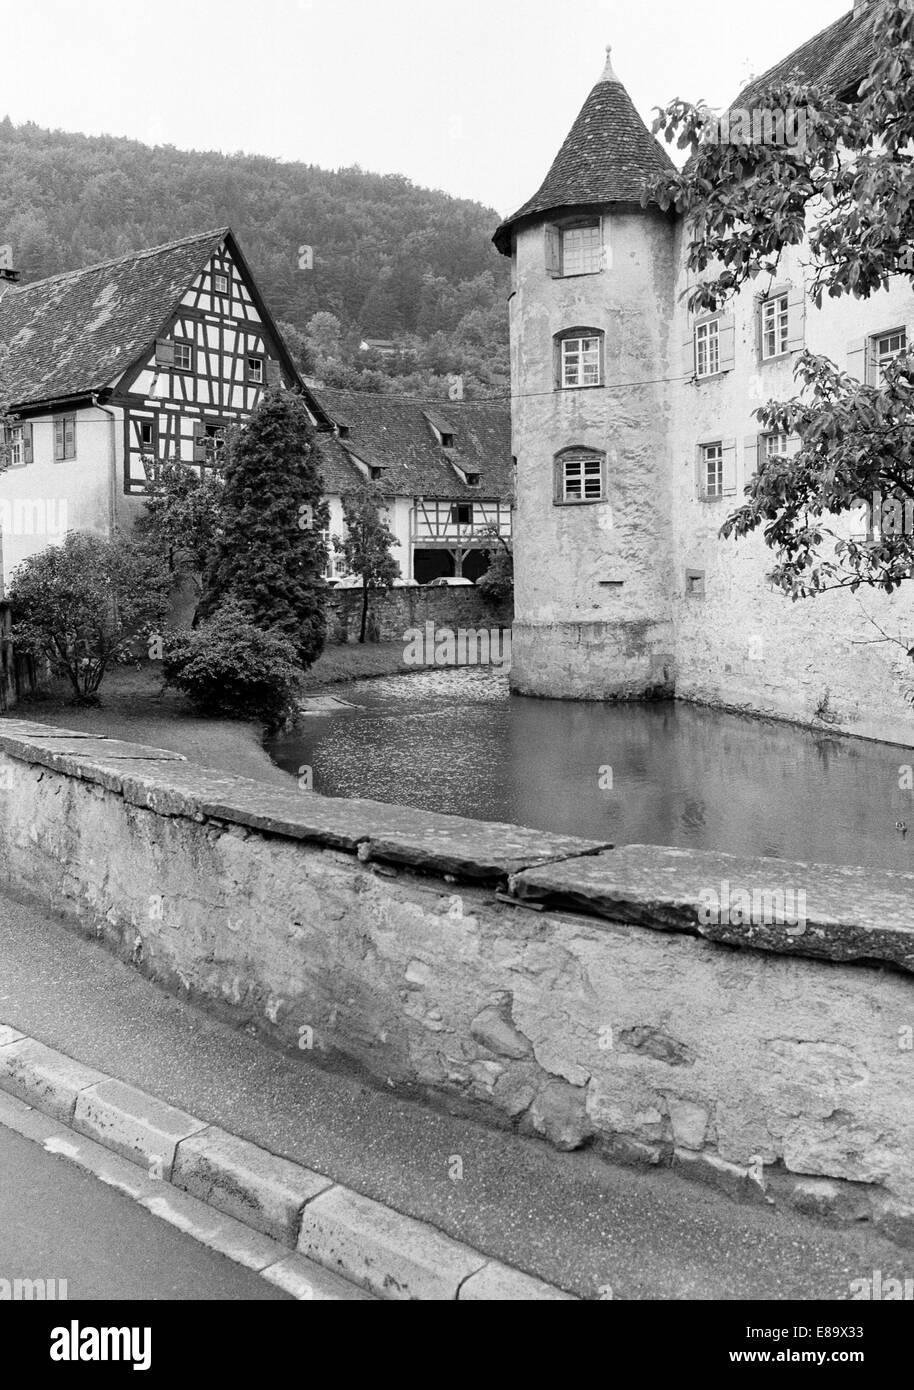 Achtziger Jahre, Wasserschloss Glatt in Sulz am Neckar, Schwarzwald, Baden-Wuerttemberg - Stock Image